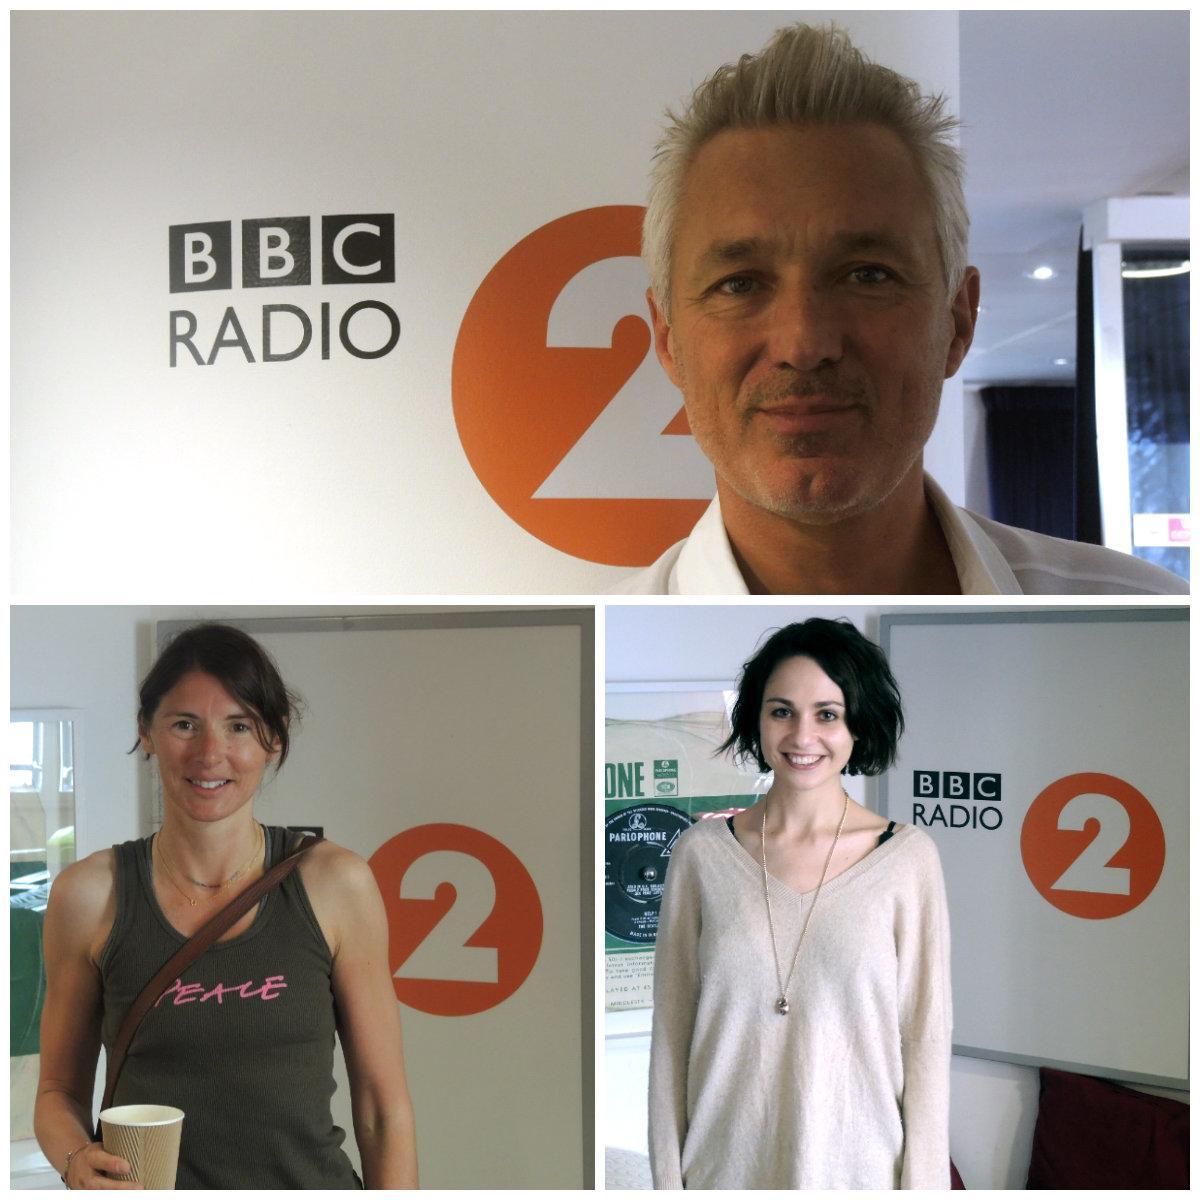 RT @BBCRadio2: Coming up with Steve Wright... @Jools_oliver_ @JamiesFoodTube @realmartinkemp @AgeofKill @Tuppence @sense8 @netflix http://t…